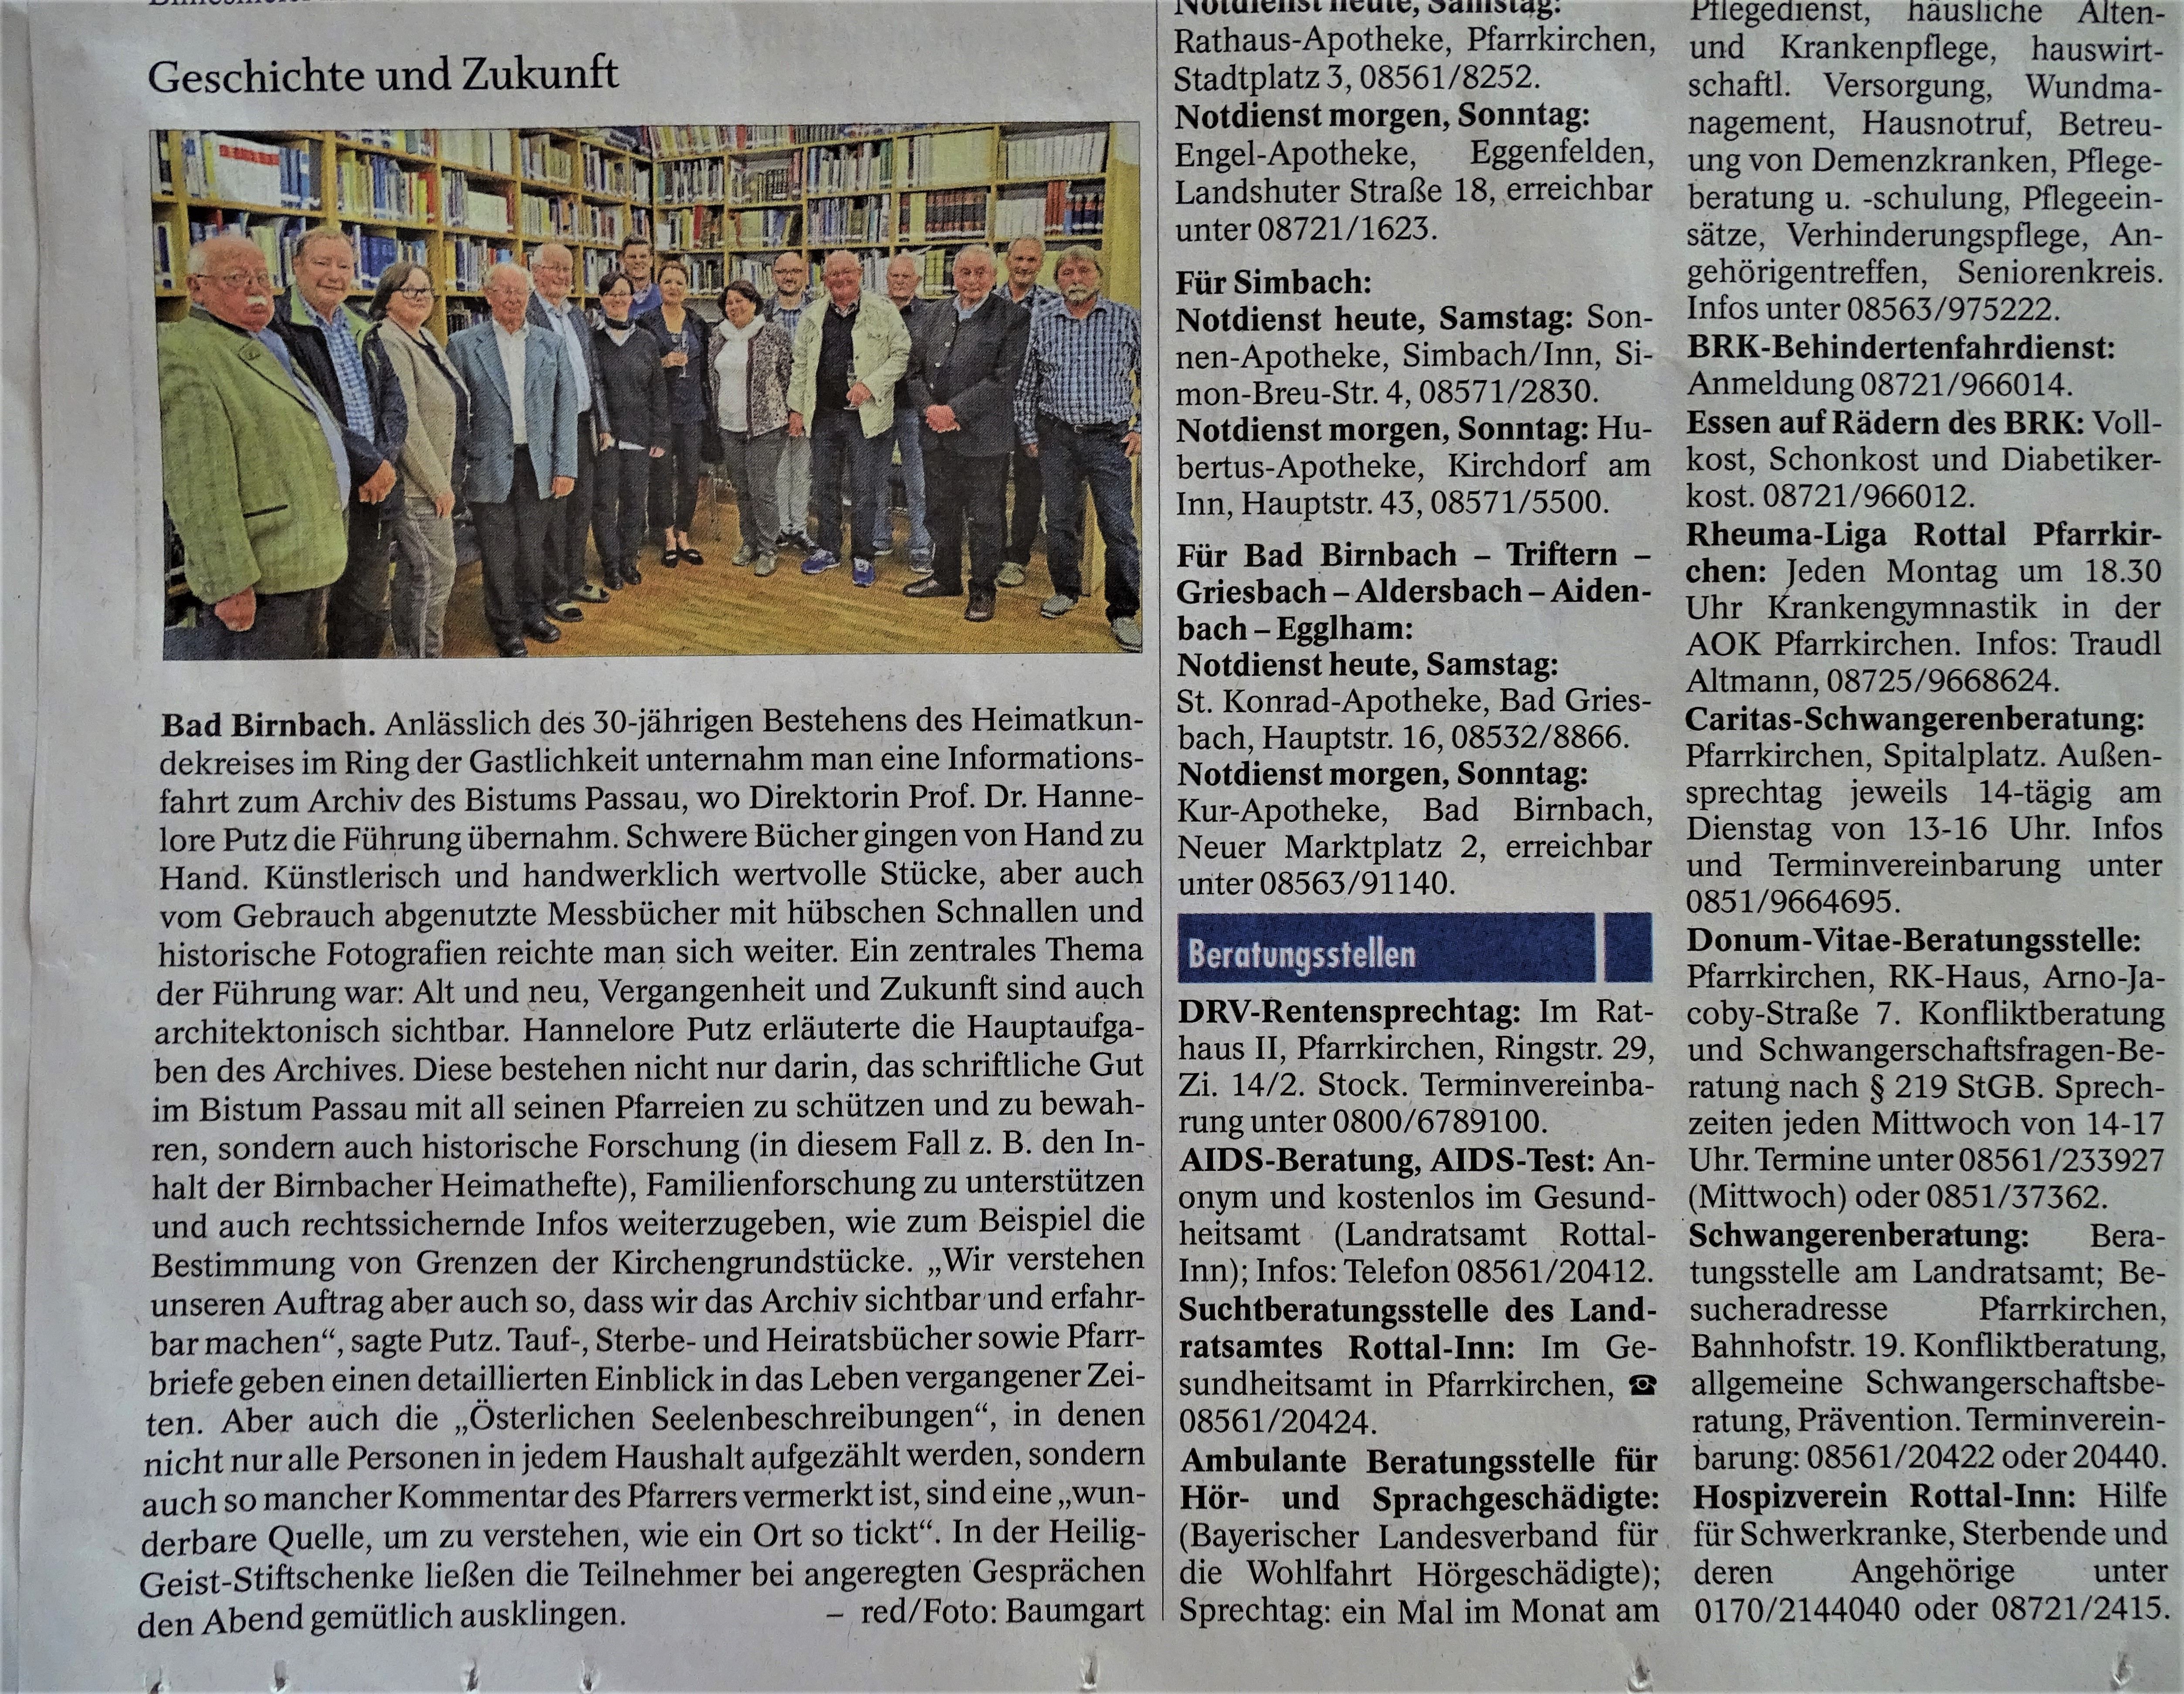 PNP_Oktober_2018_Heimatkundekreis_Bad_Birnbach_Nadia_Baumgart